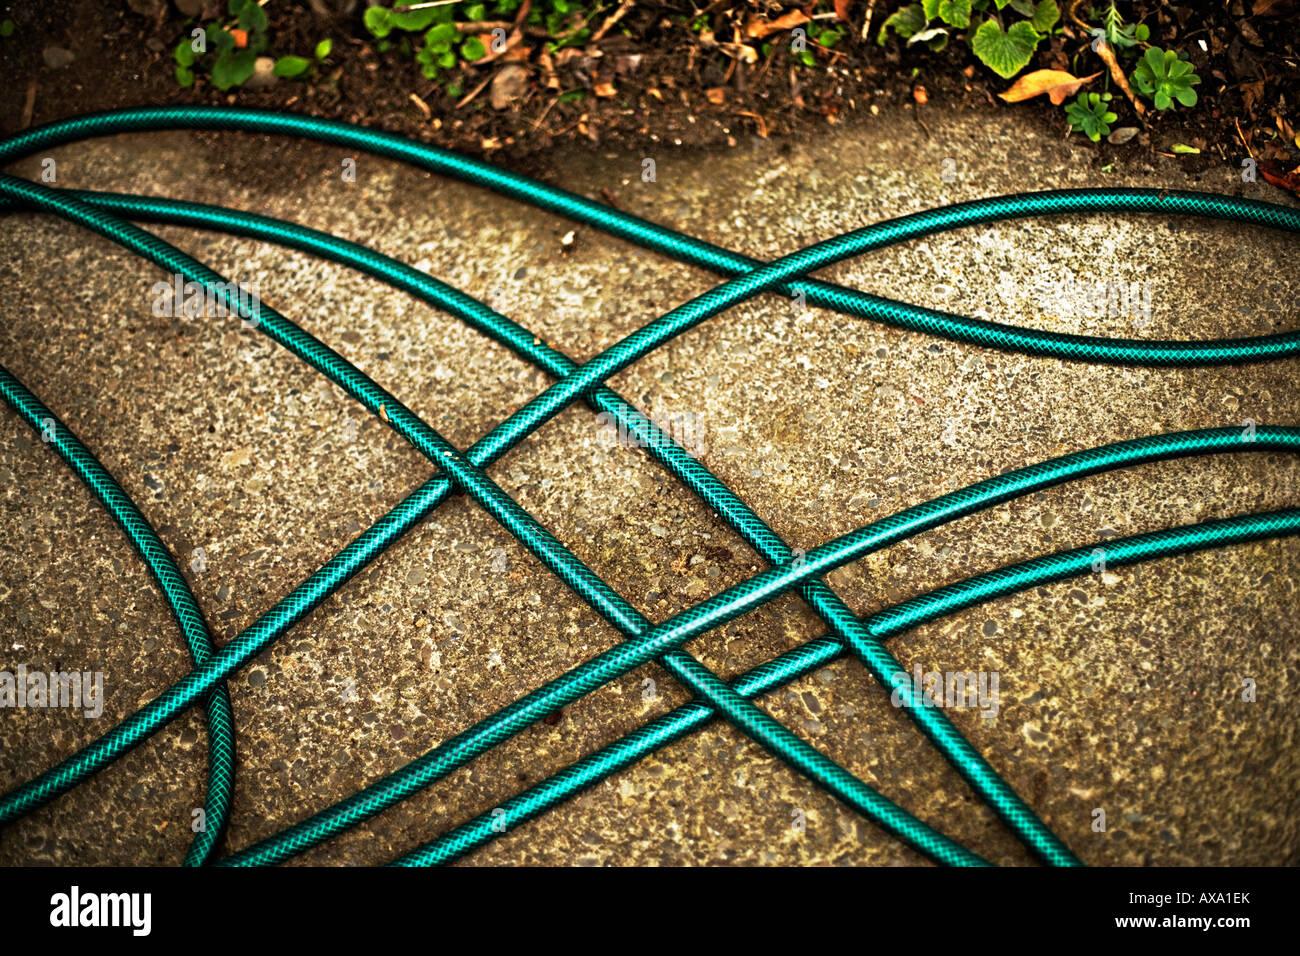 Jardin arrosage sur chemin de béton Photo Stock